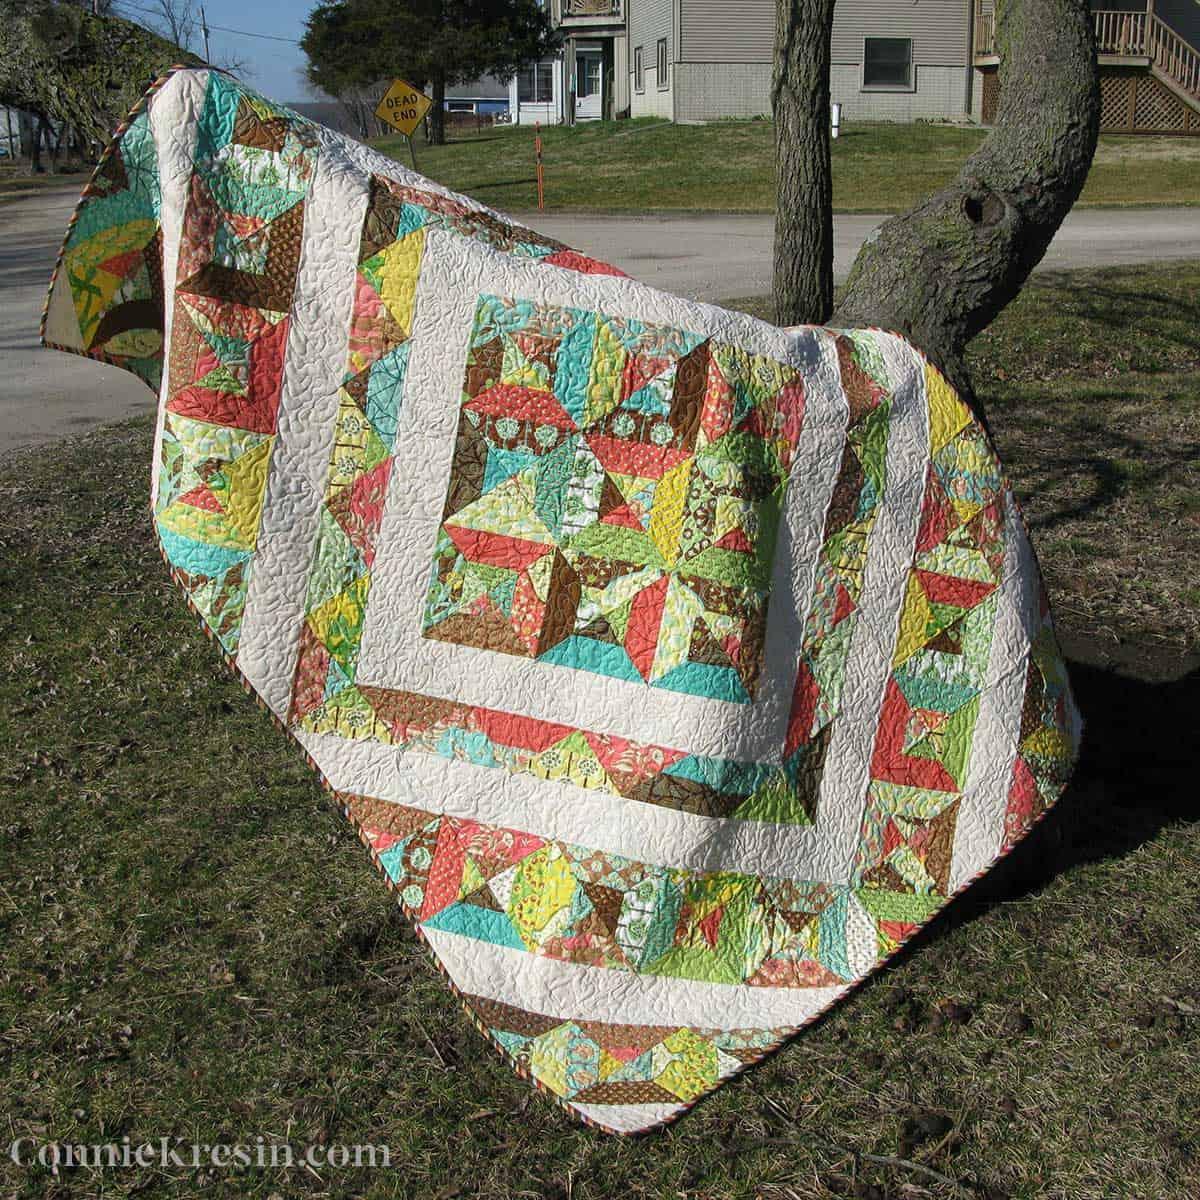 quilt on a tree limb